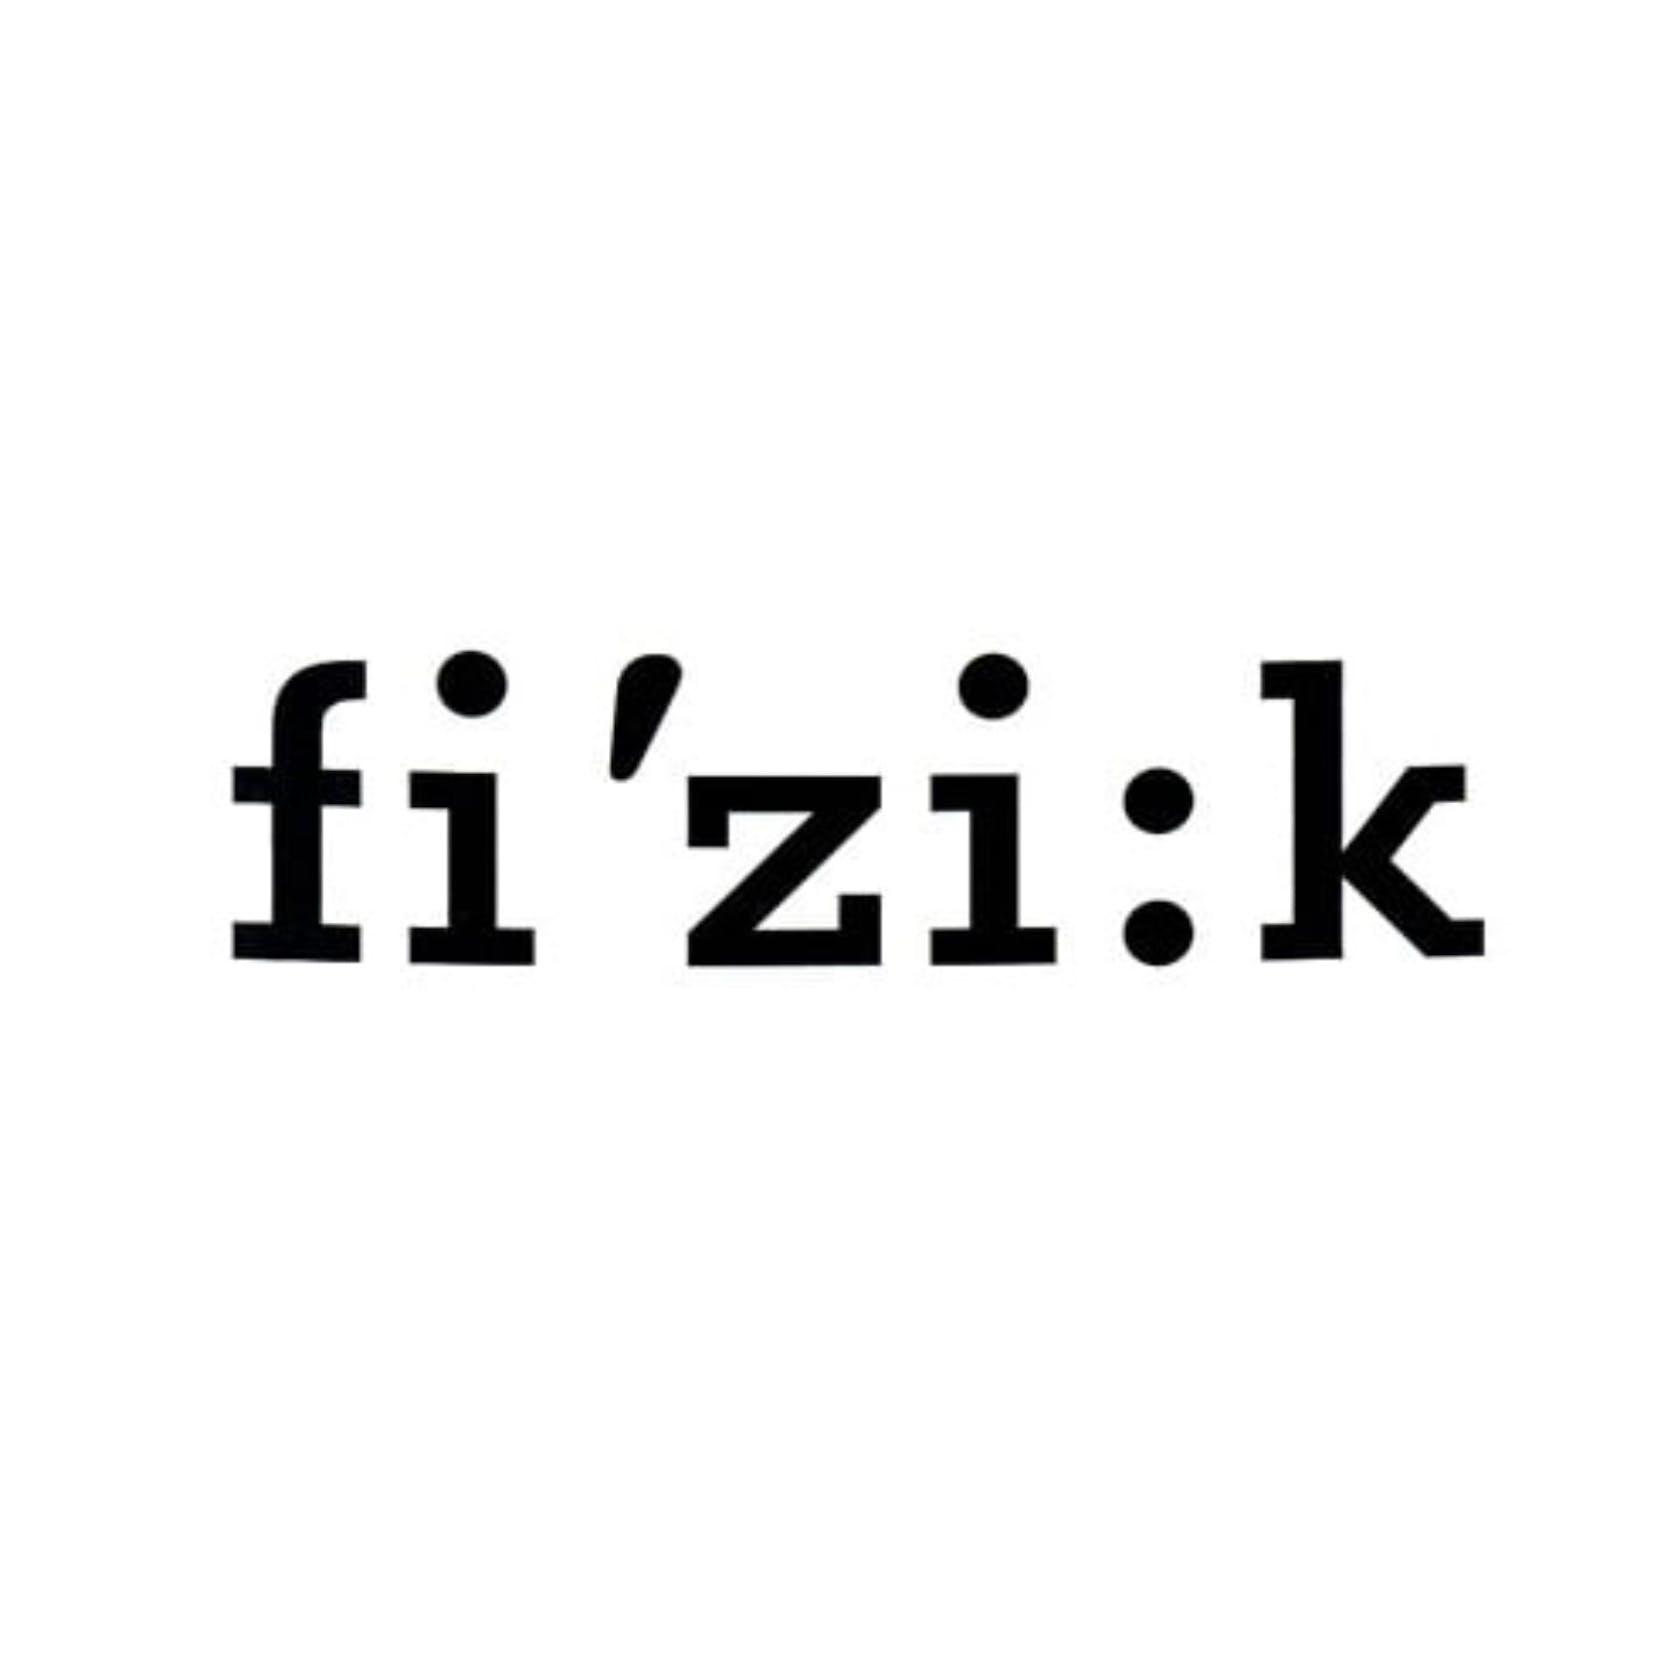 Fizik shop online